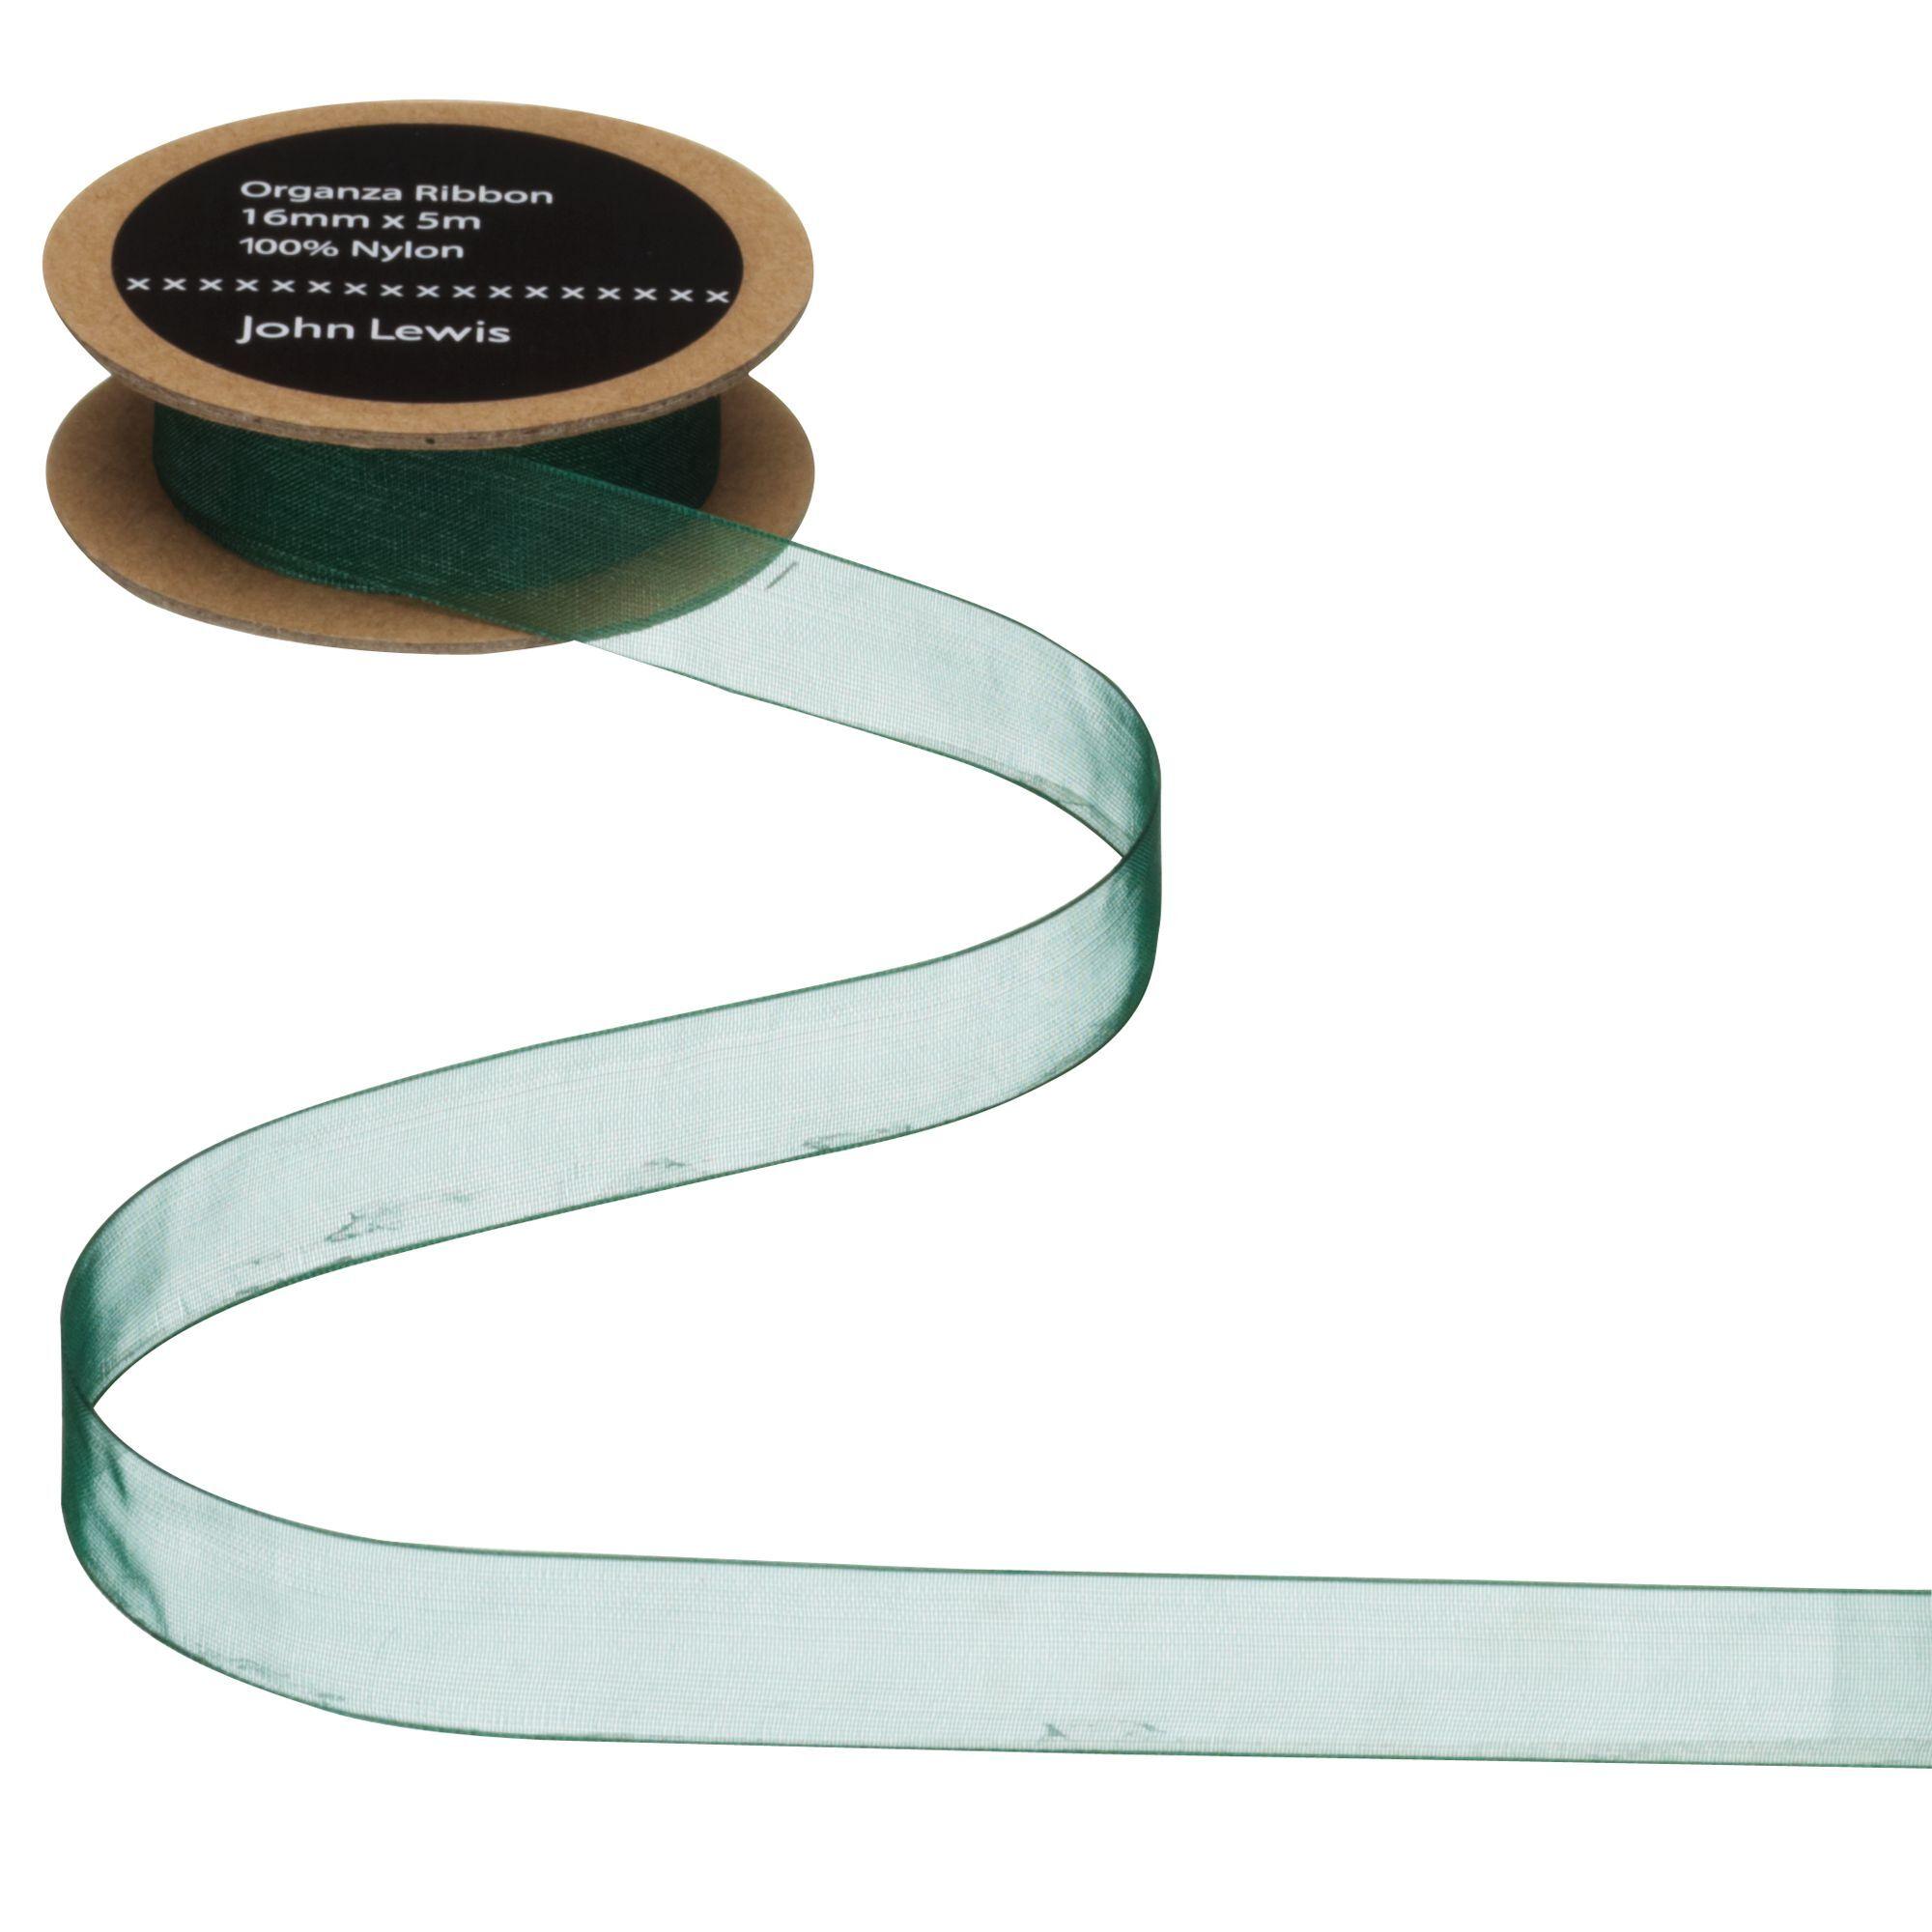 John Lewis & Partners Woven Edge Organza Ribbon  - Green - Size: 38mm